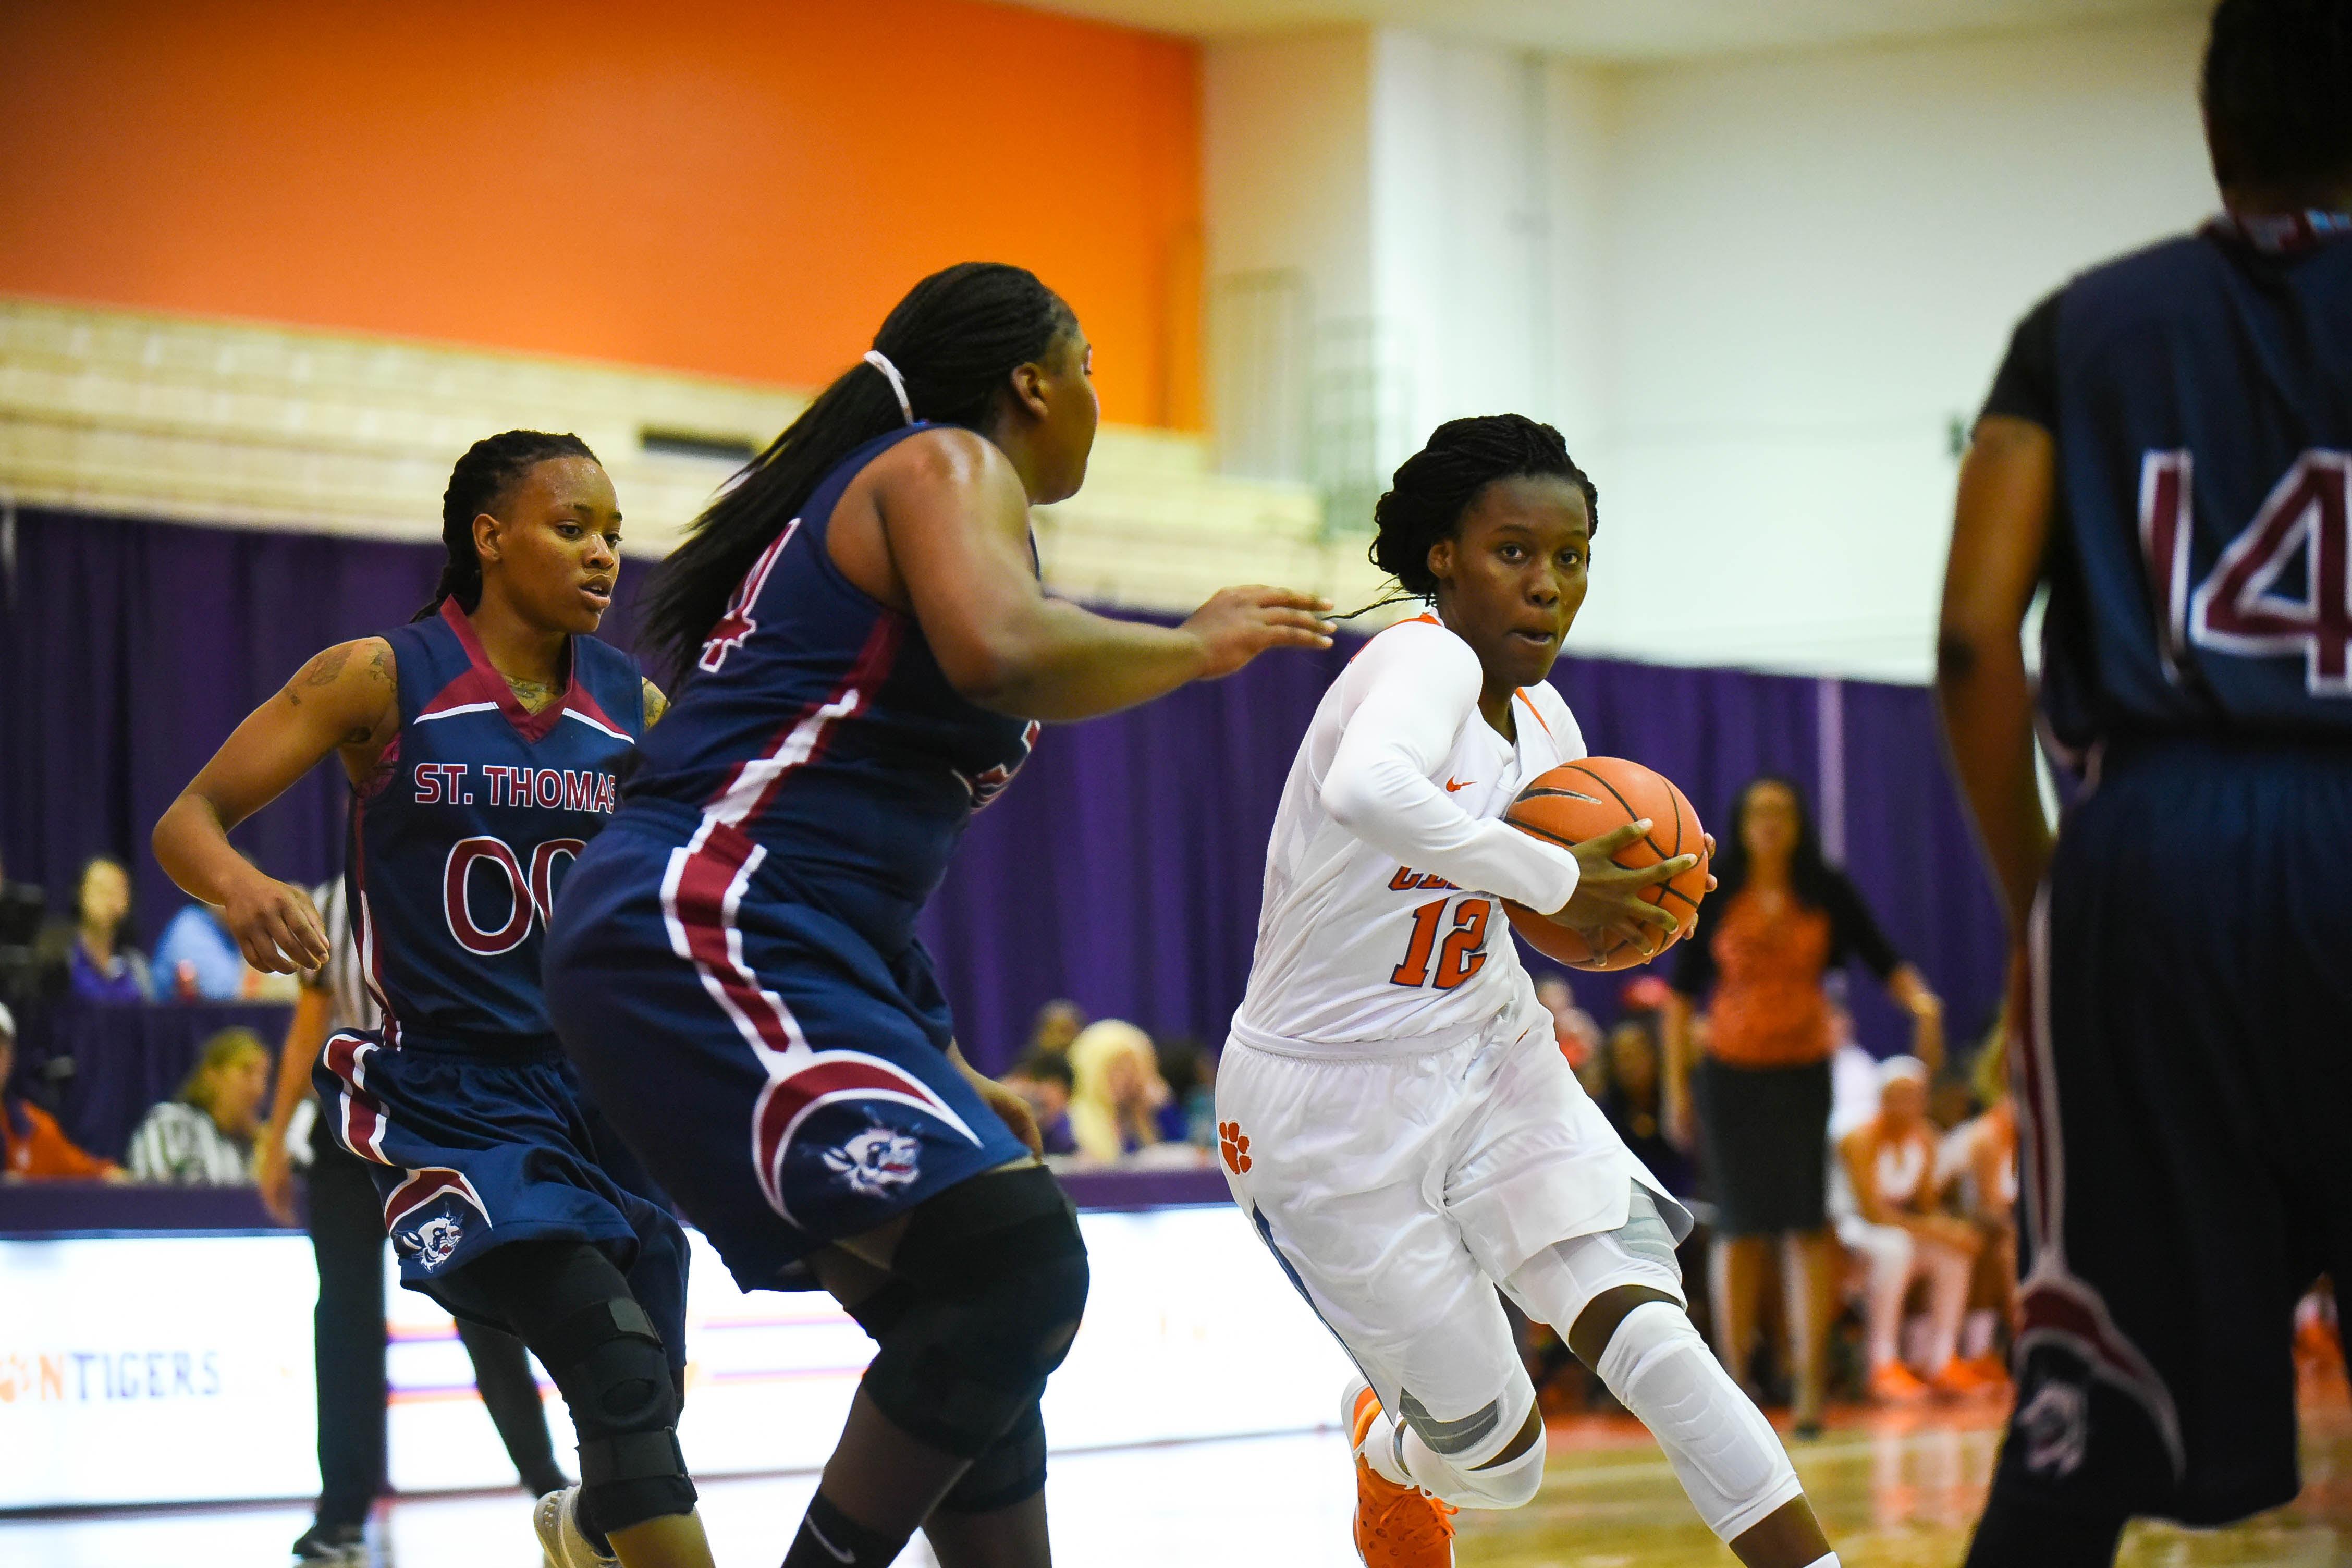 Lady Tigers Drop Close Decision to Georgia Tech